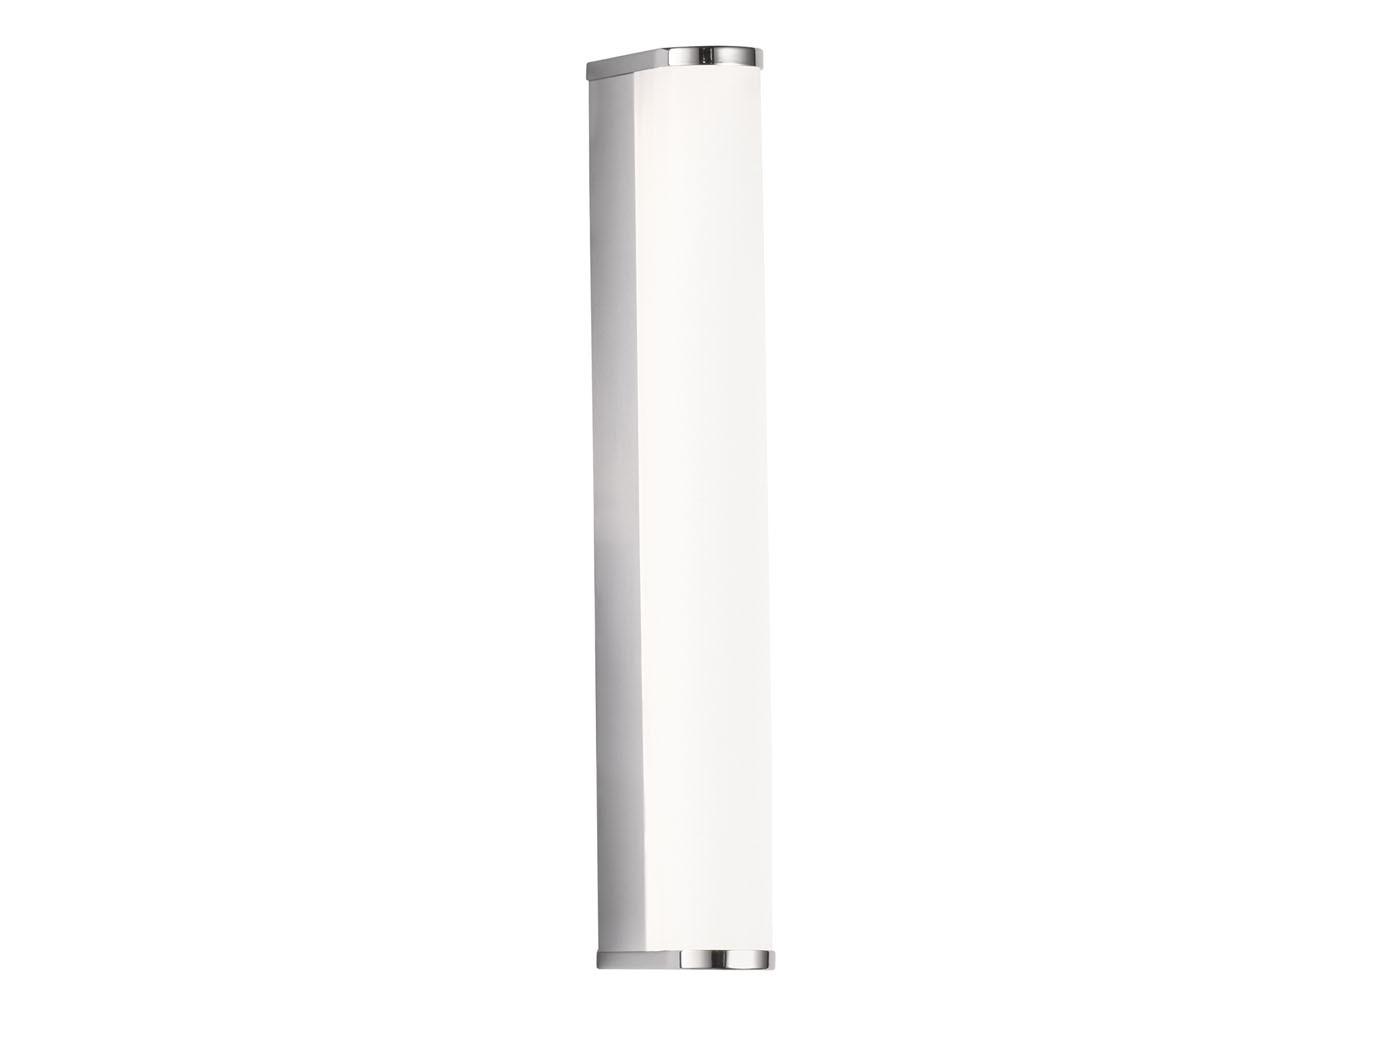 Klassische Honsel LED Badezimmer Wandlampe Spiegelleuchte 30 cm ...